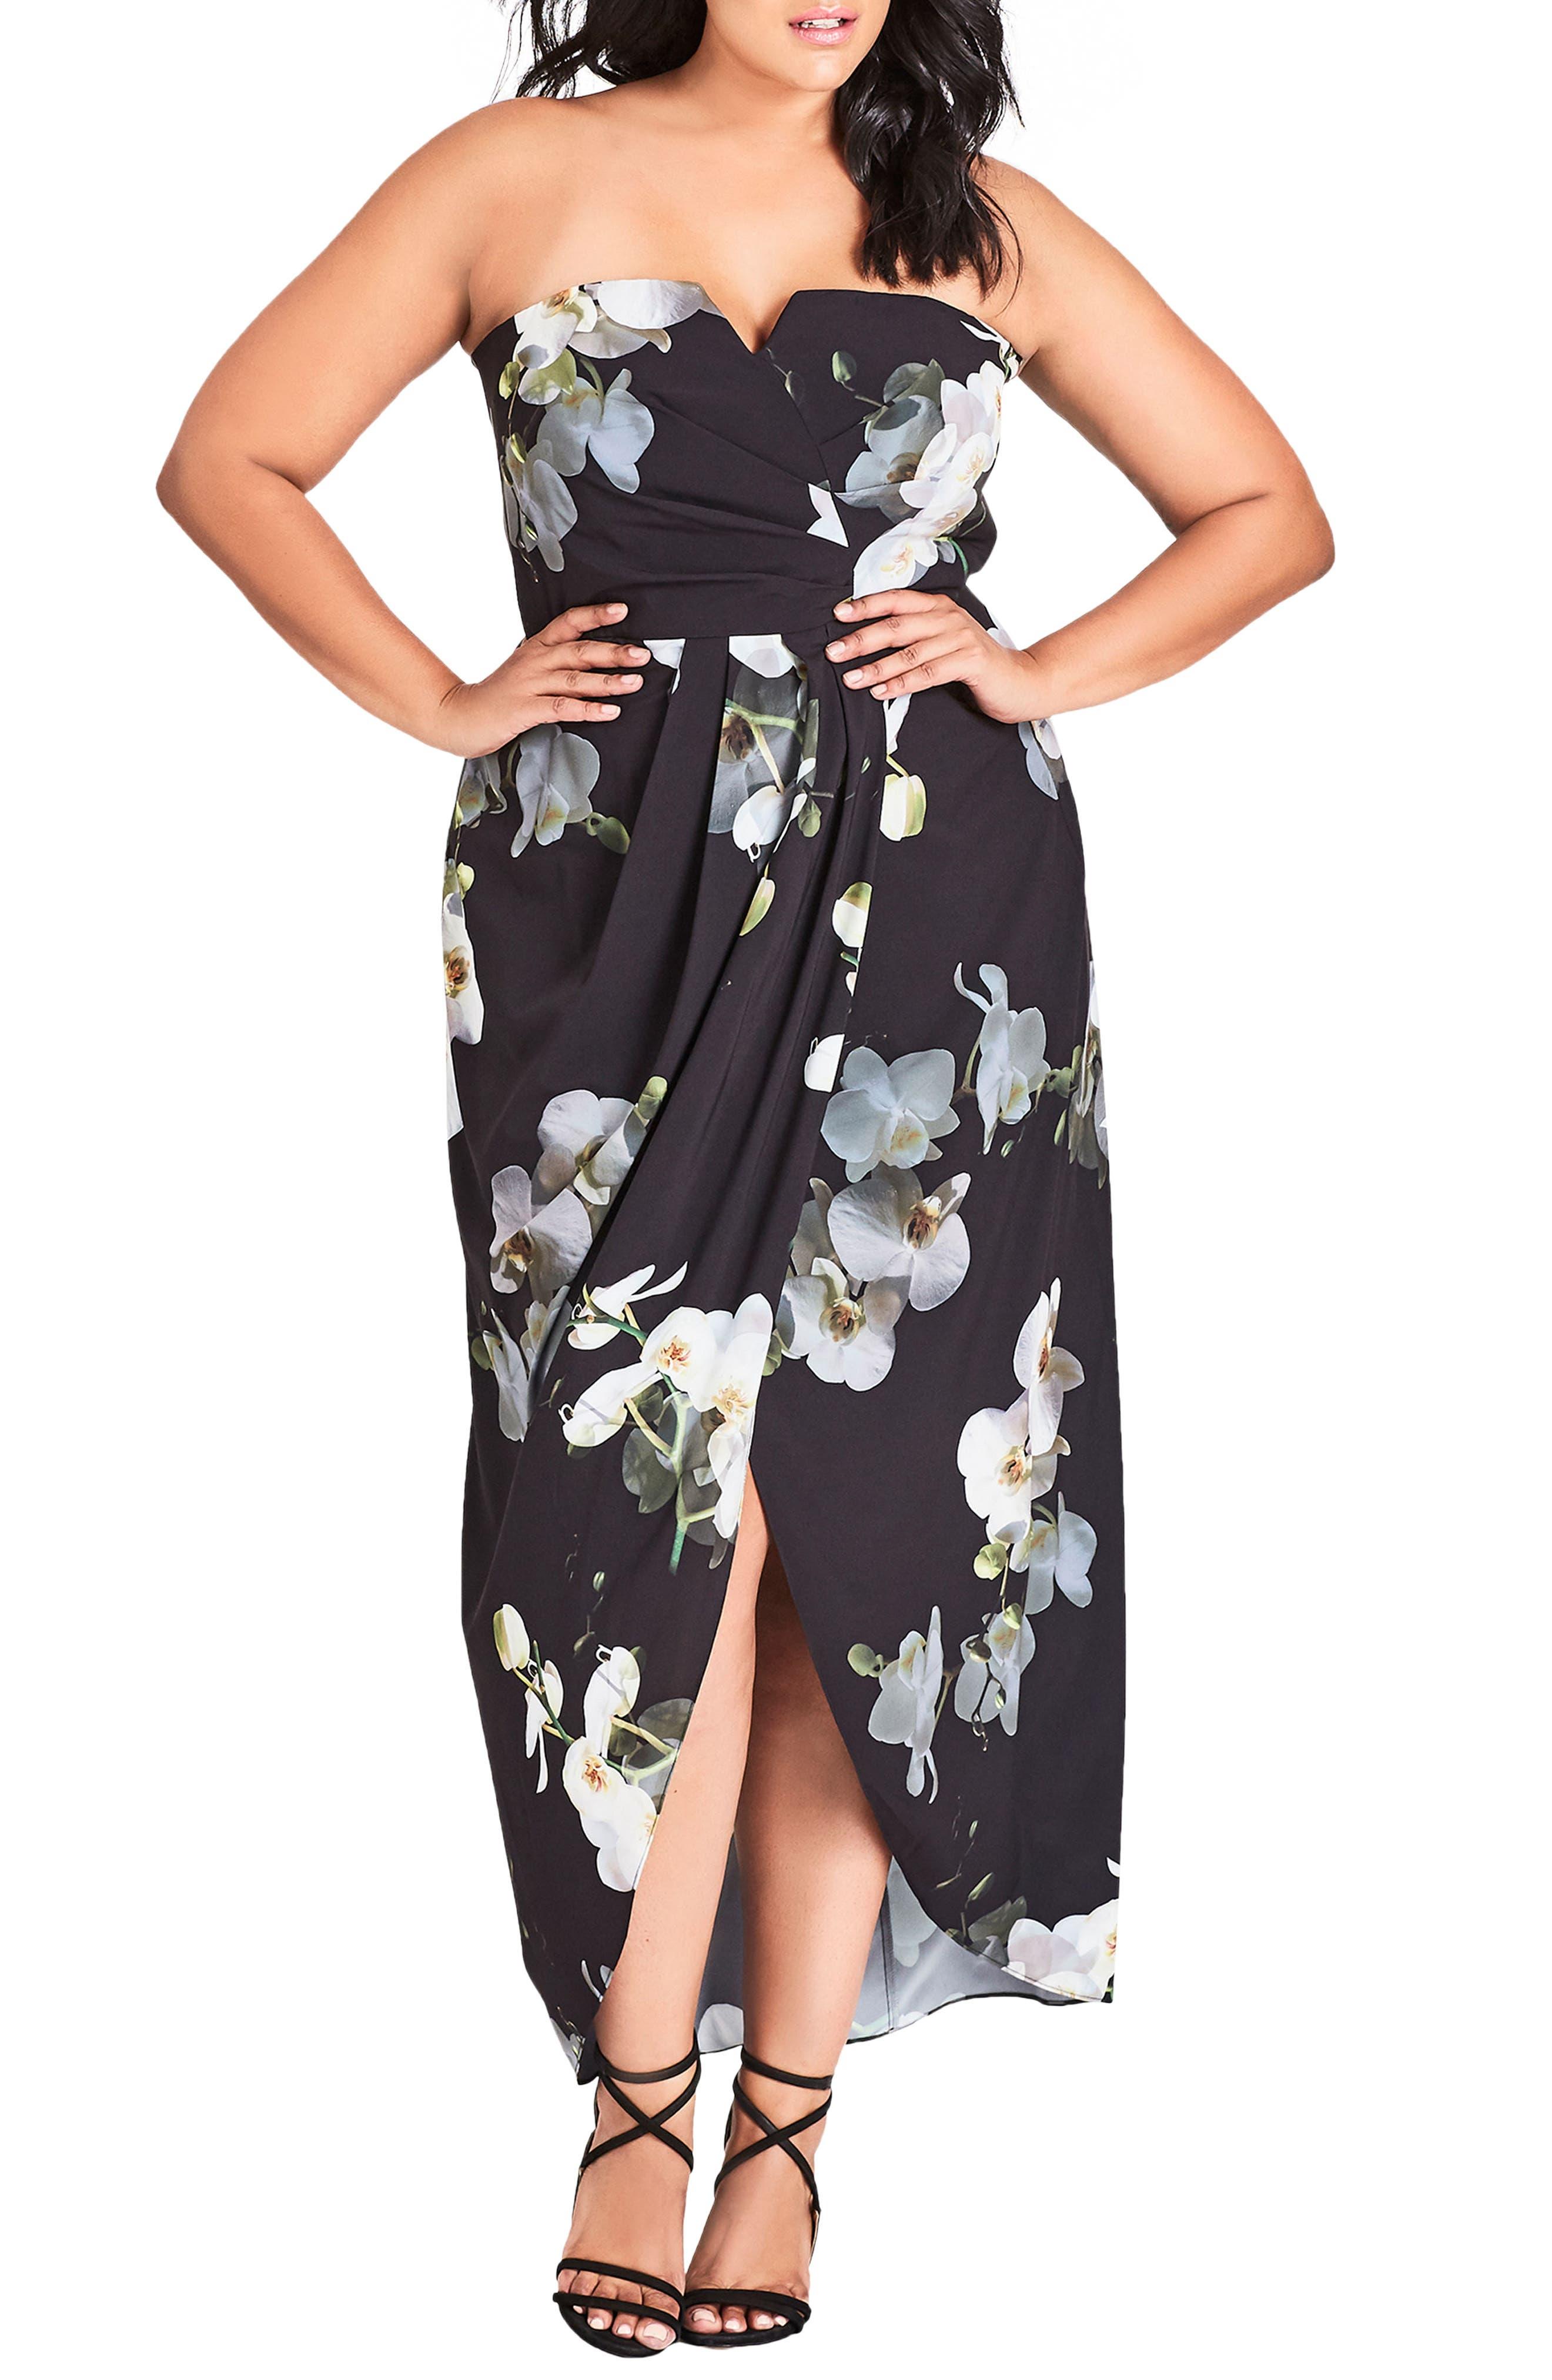 Orchid Dreams Strapless Maxi Dress,                         Main,                         color, ORCHID DREAMS